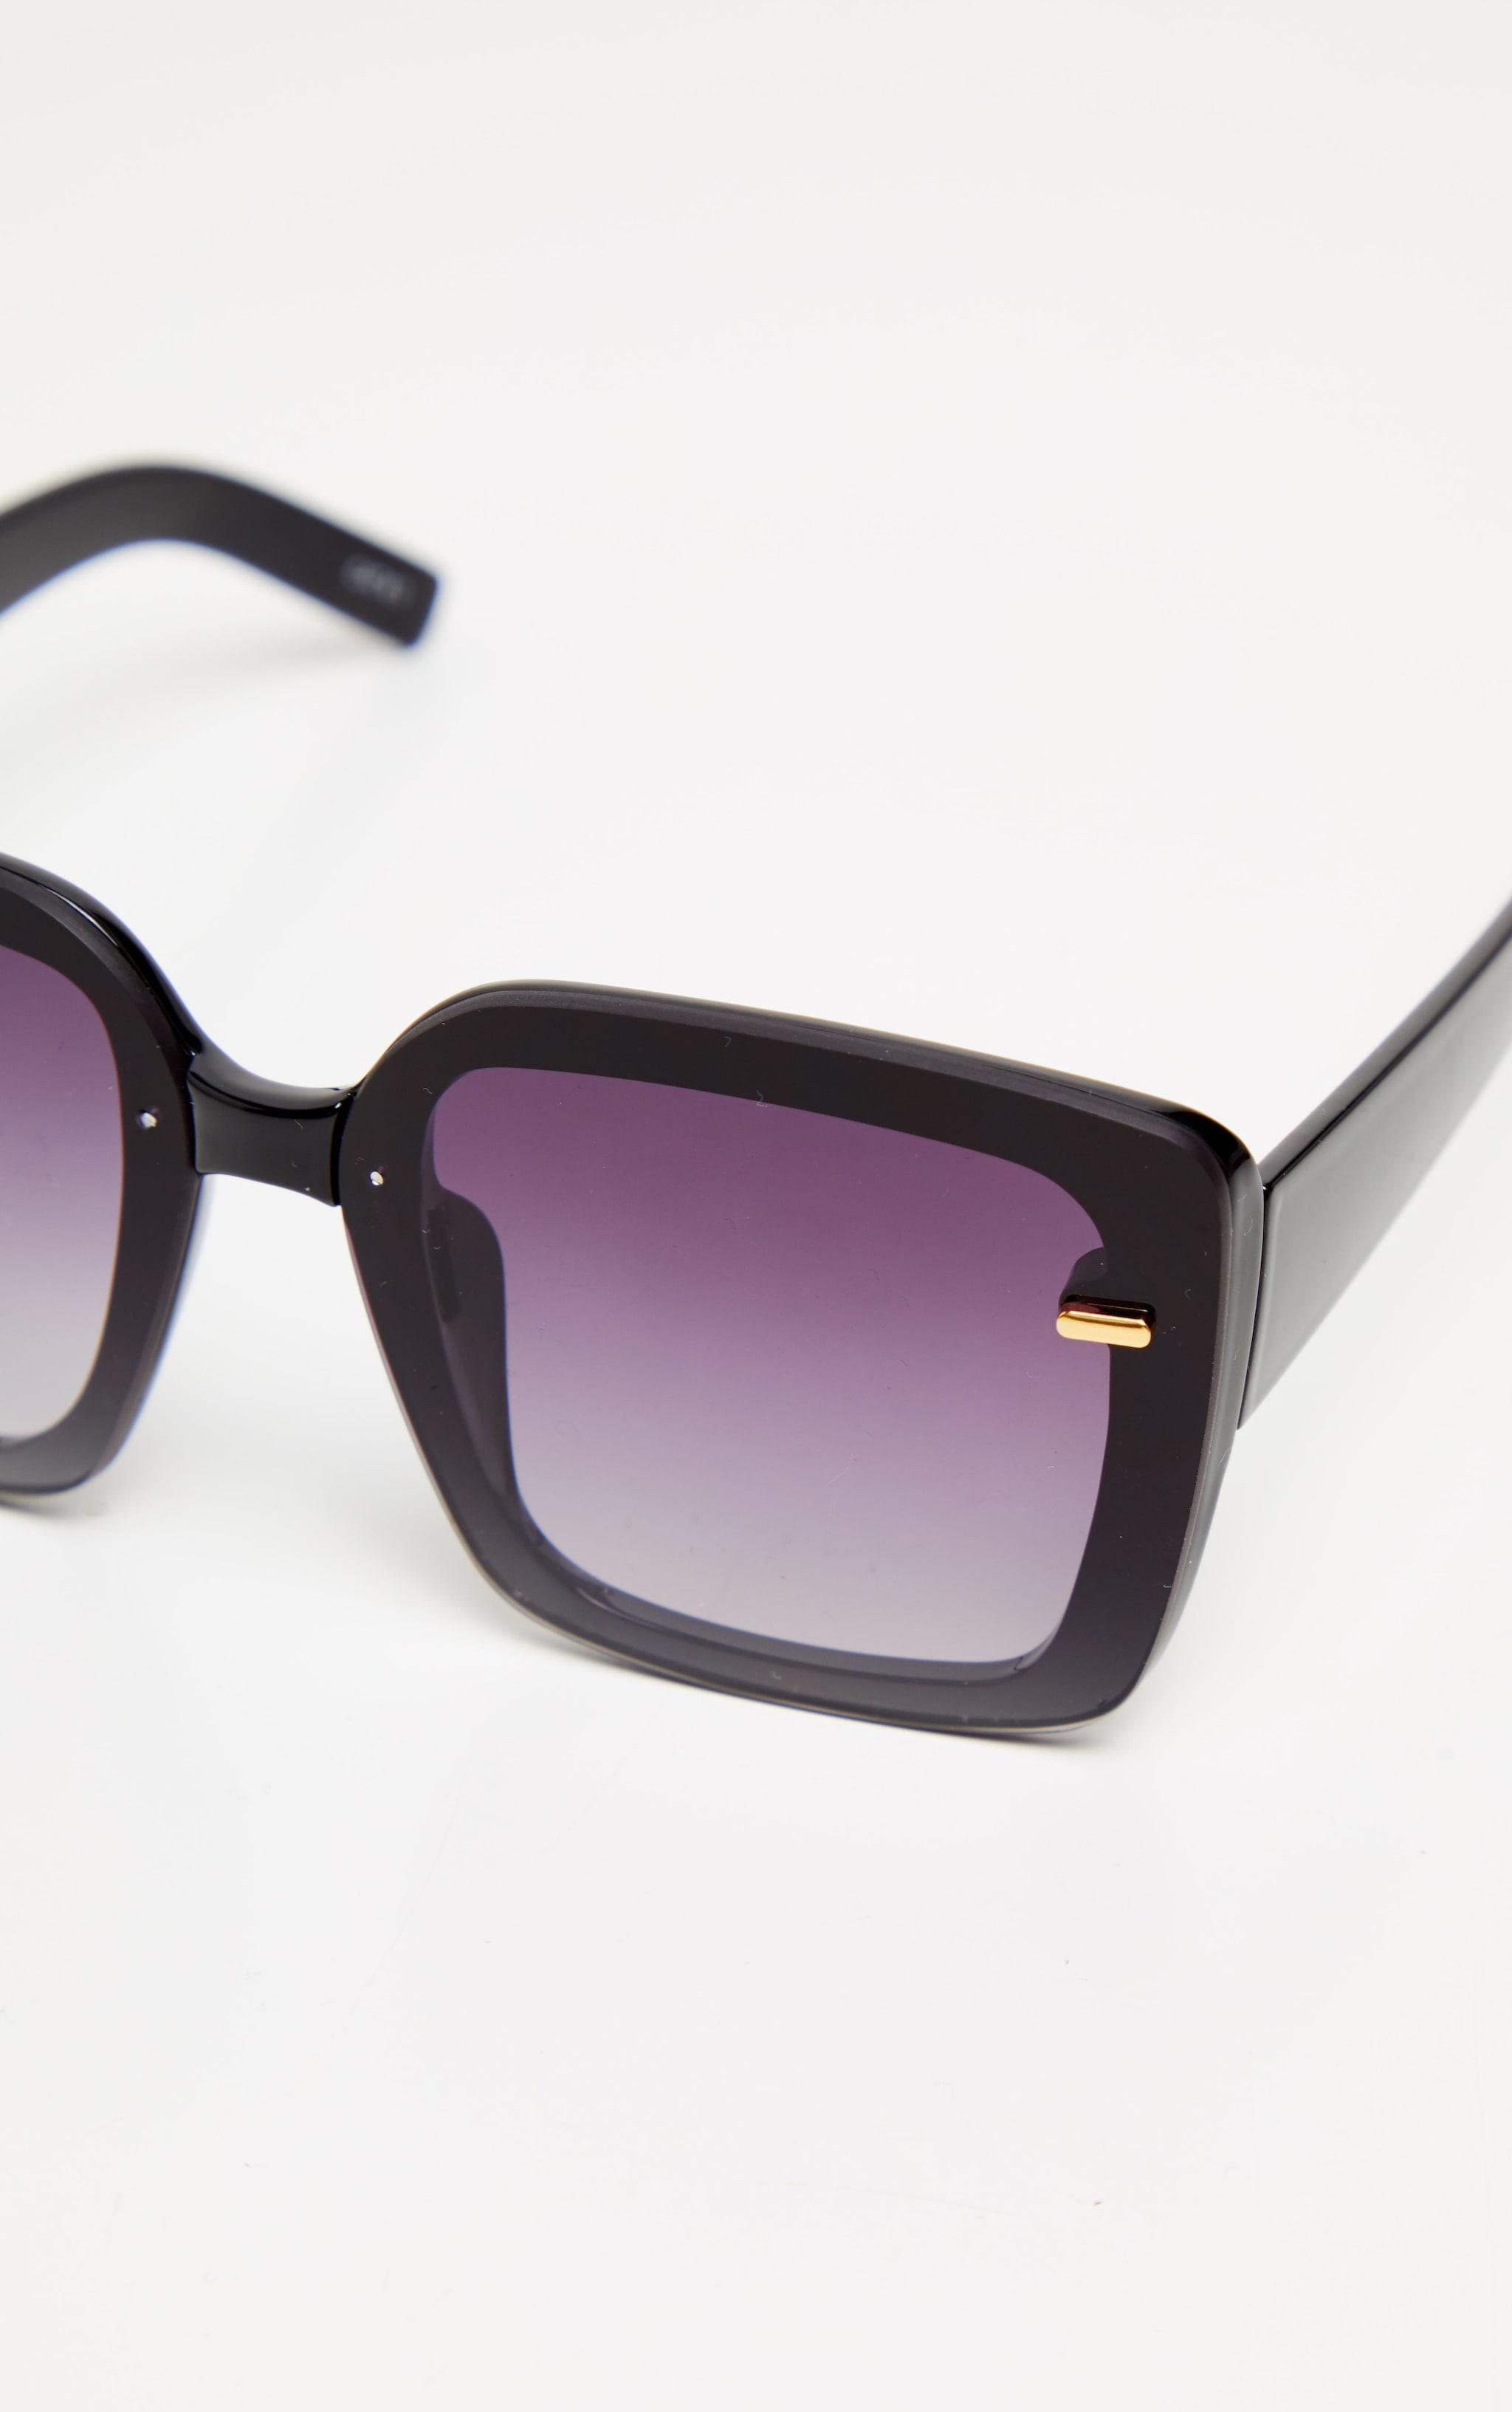 Black Oversized Gold Trim Square Frame Sunglasses 3